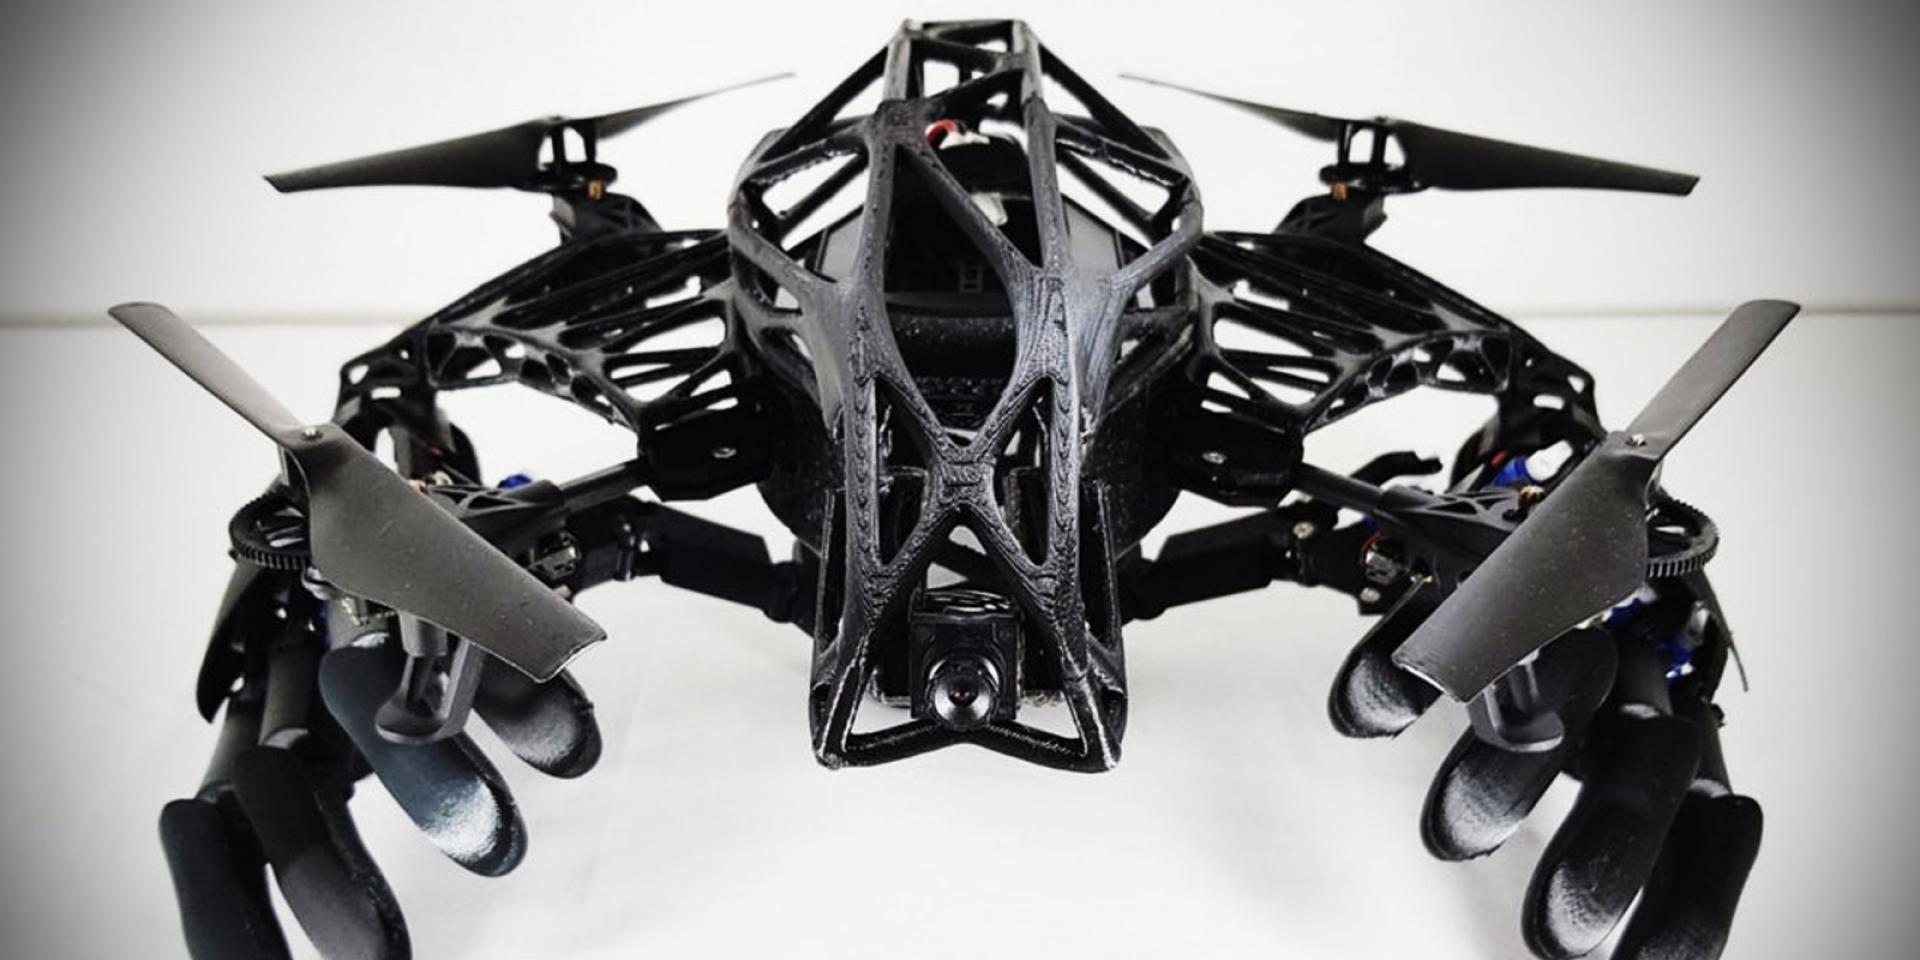 來自蝙蝠俠的黑科技!?Youbionic仿生無人機DRONE FOR HANDY